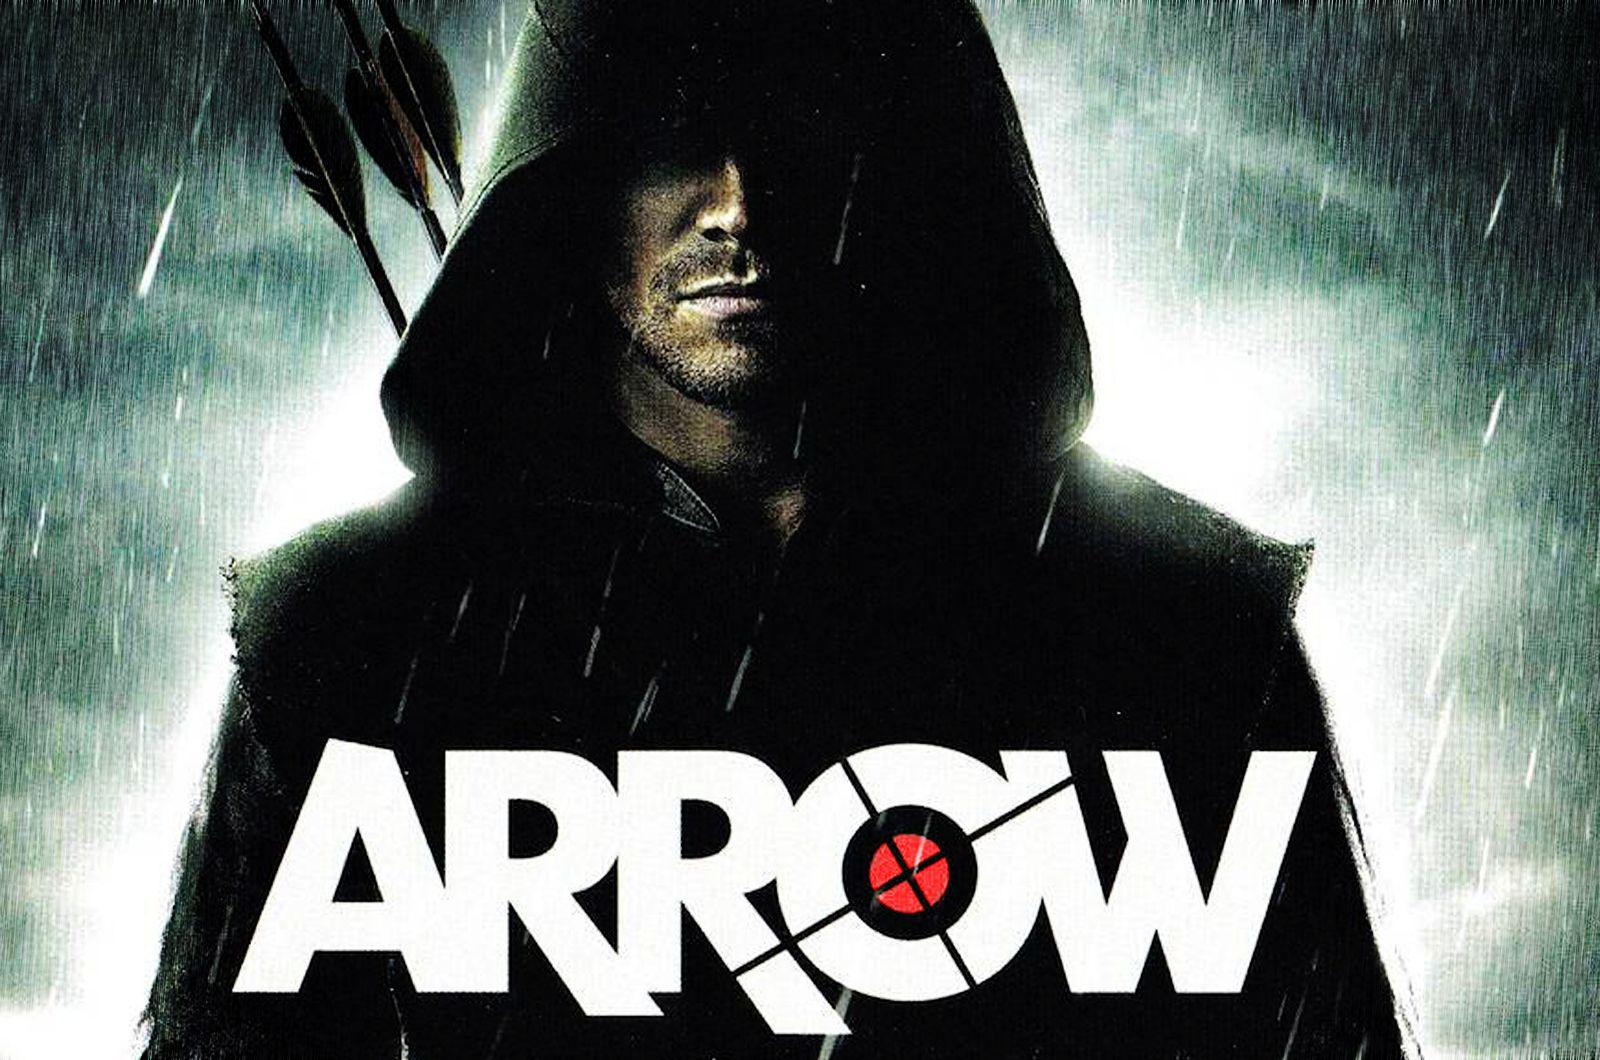 Most Inspiring Wallpaper Movie Arrow - e32bdc20671357c4155ee7158e831182  2018_234794.jpg